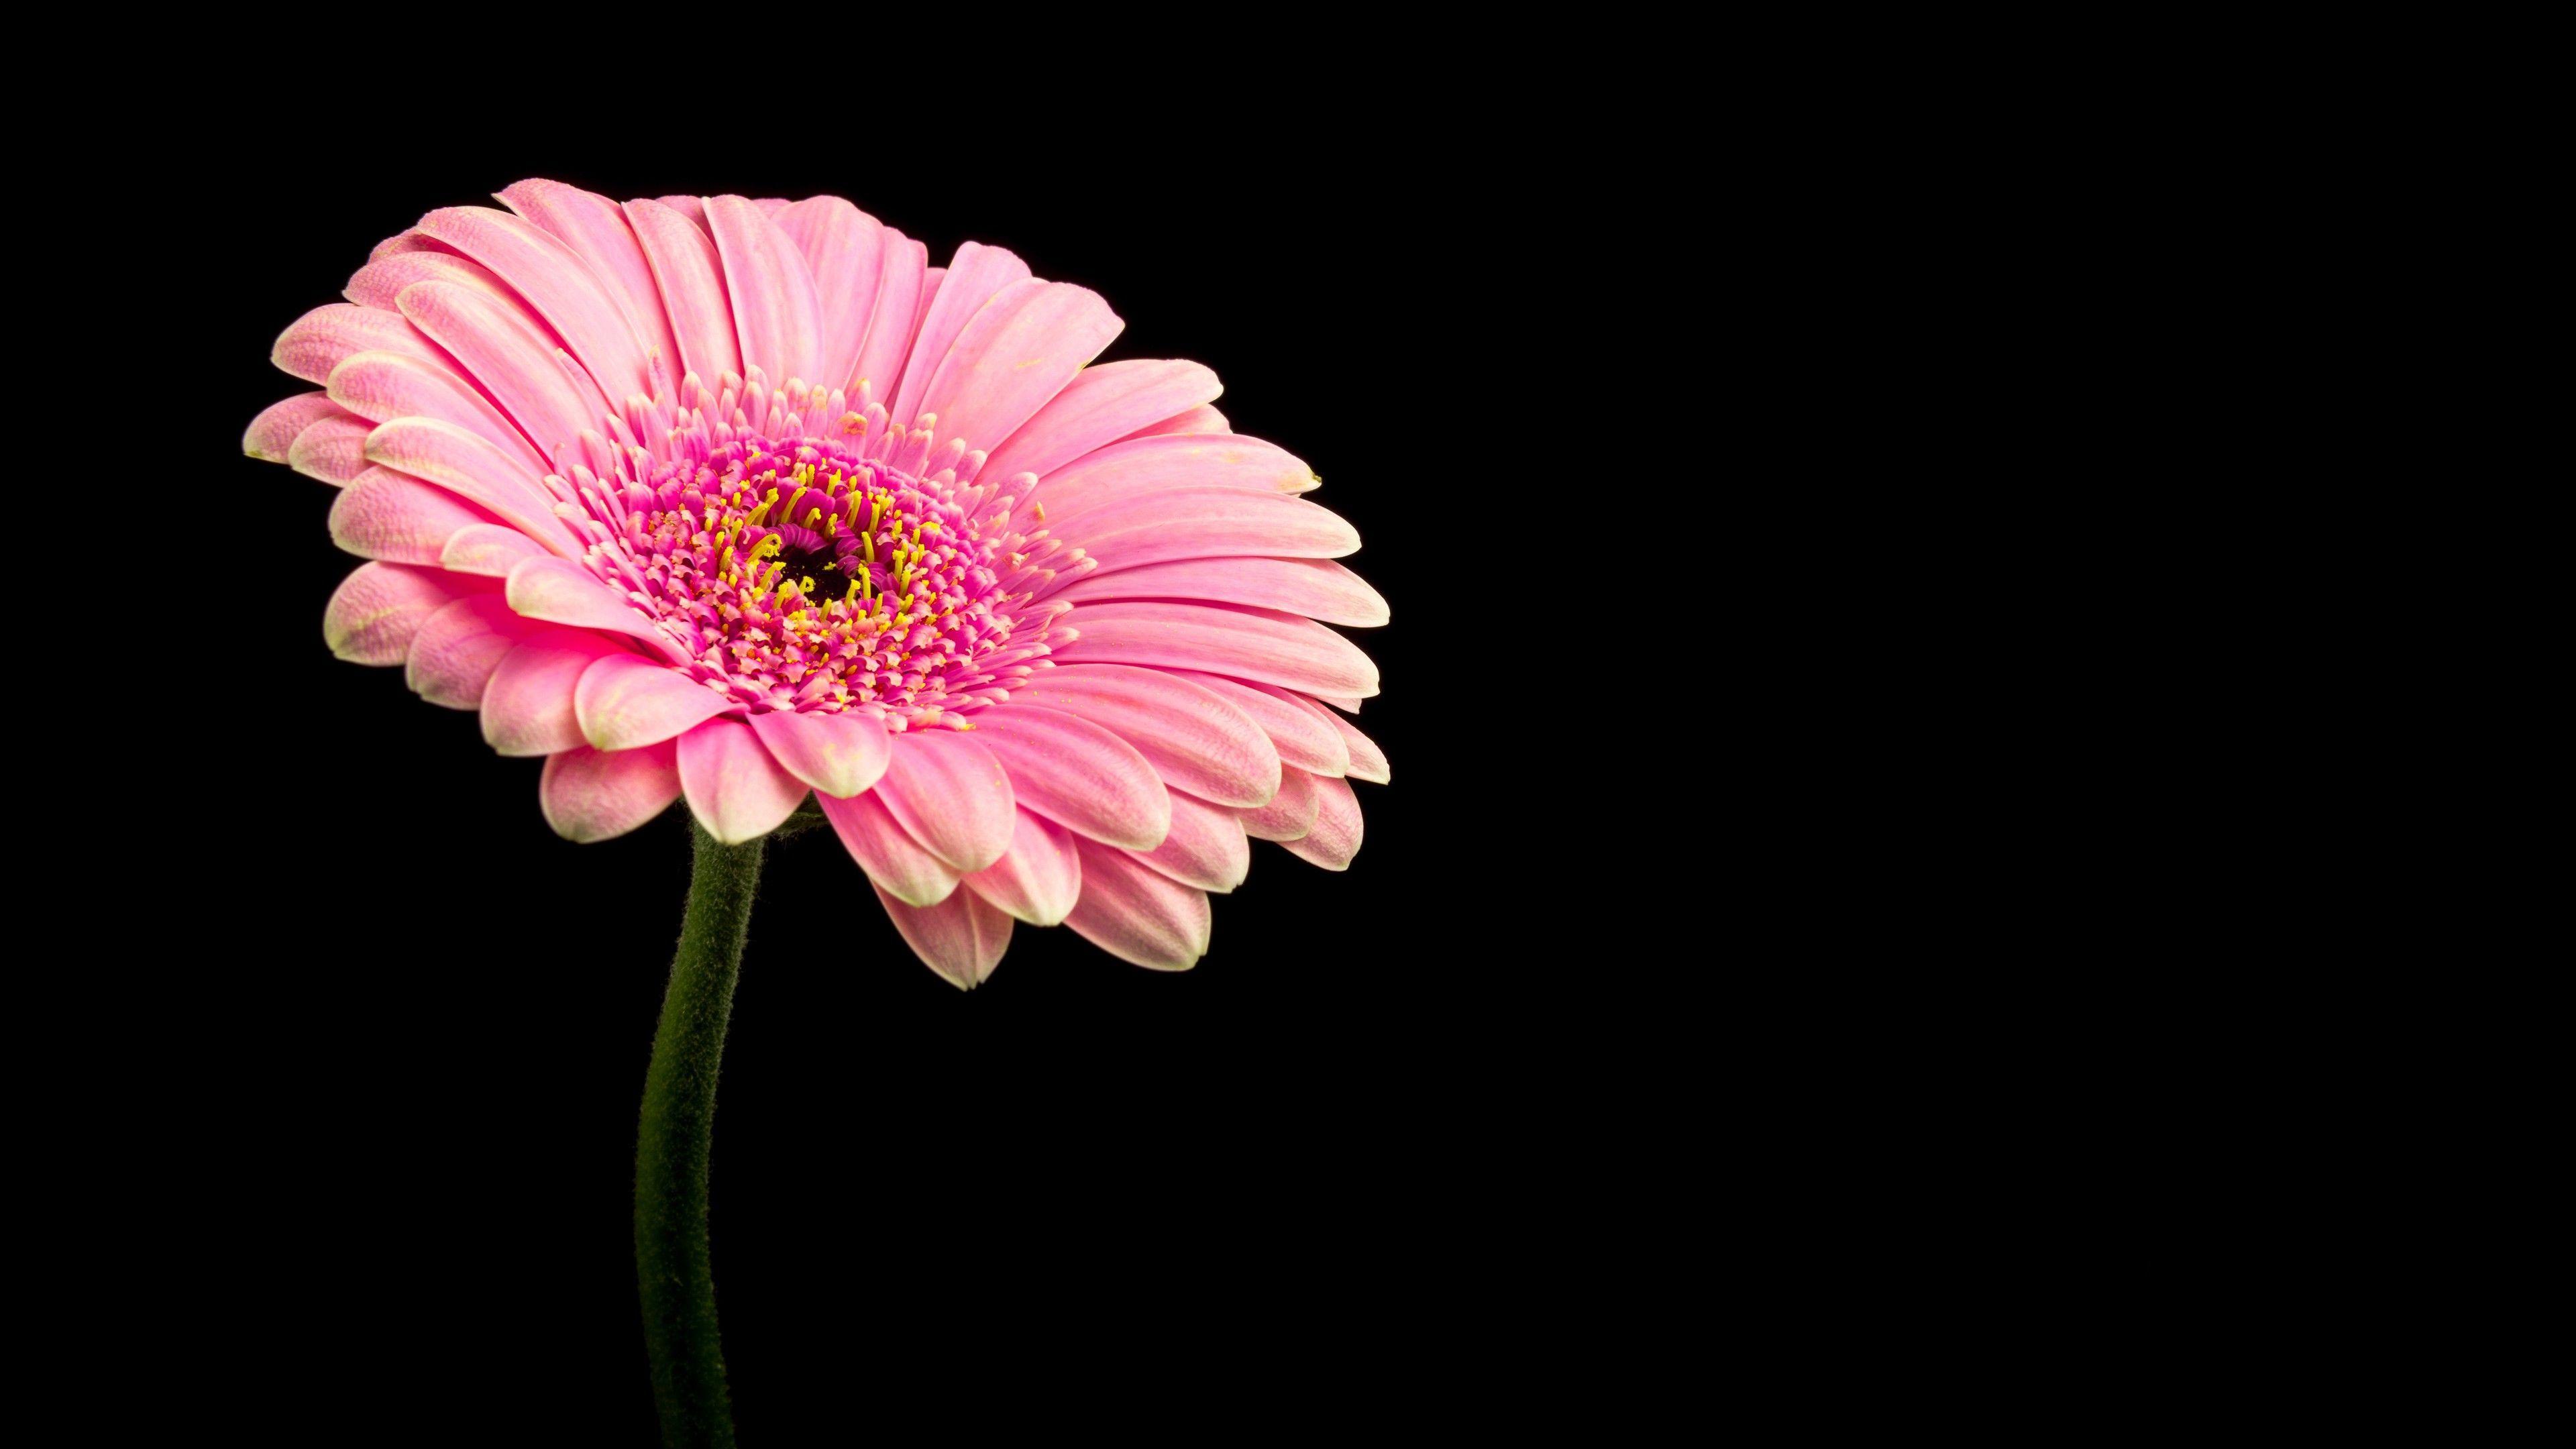 Pink Daisy Flower 4k Wallpaper Pink Daisy Daisy Flower Flowers